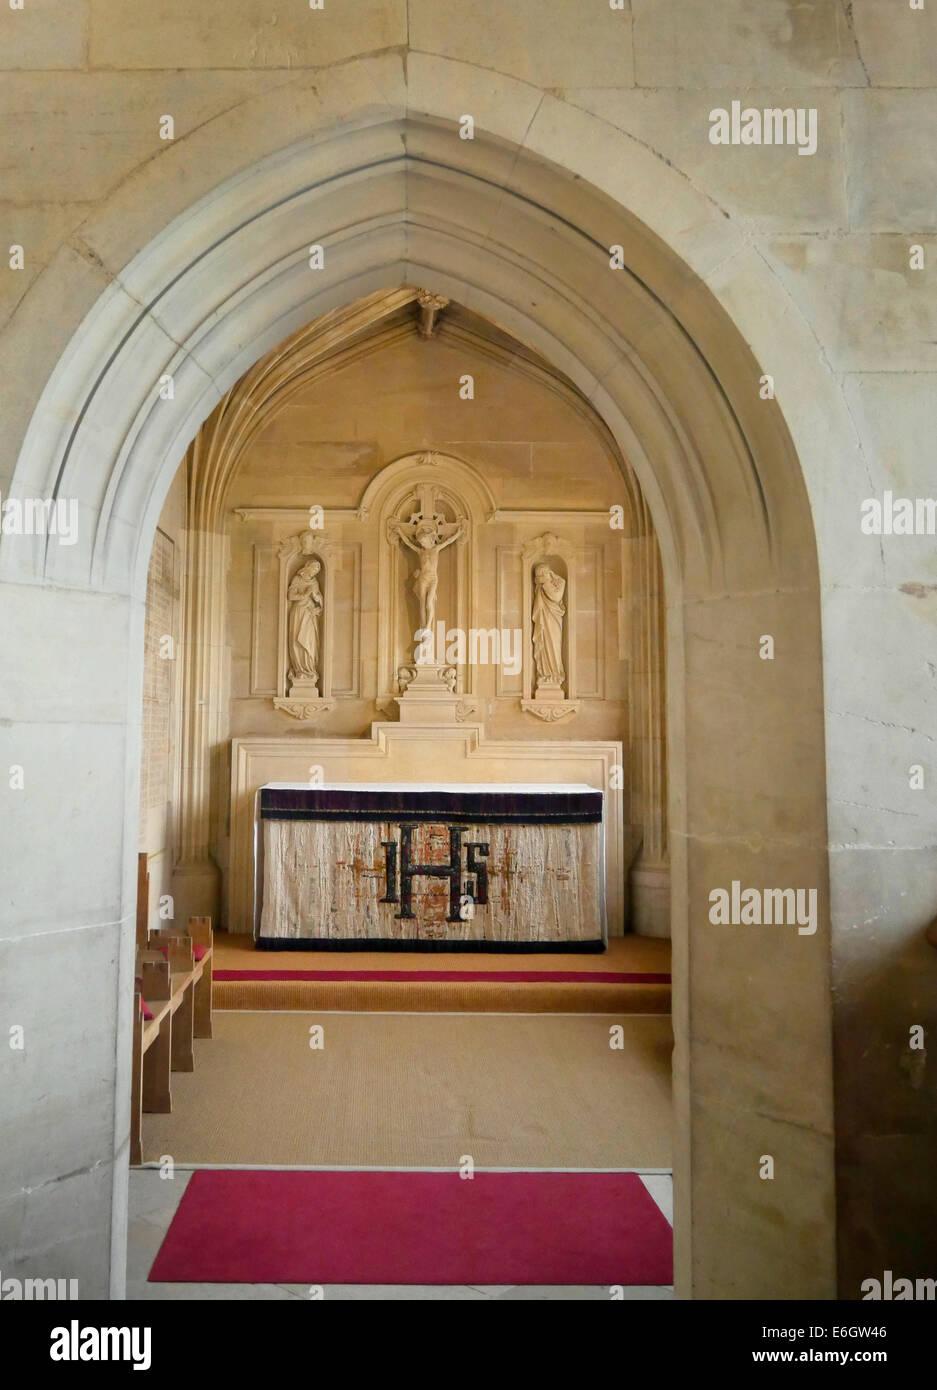 interior of kings college chapel cambridge england - Stock Image